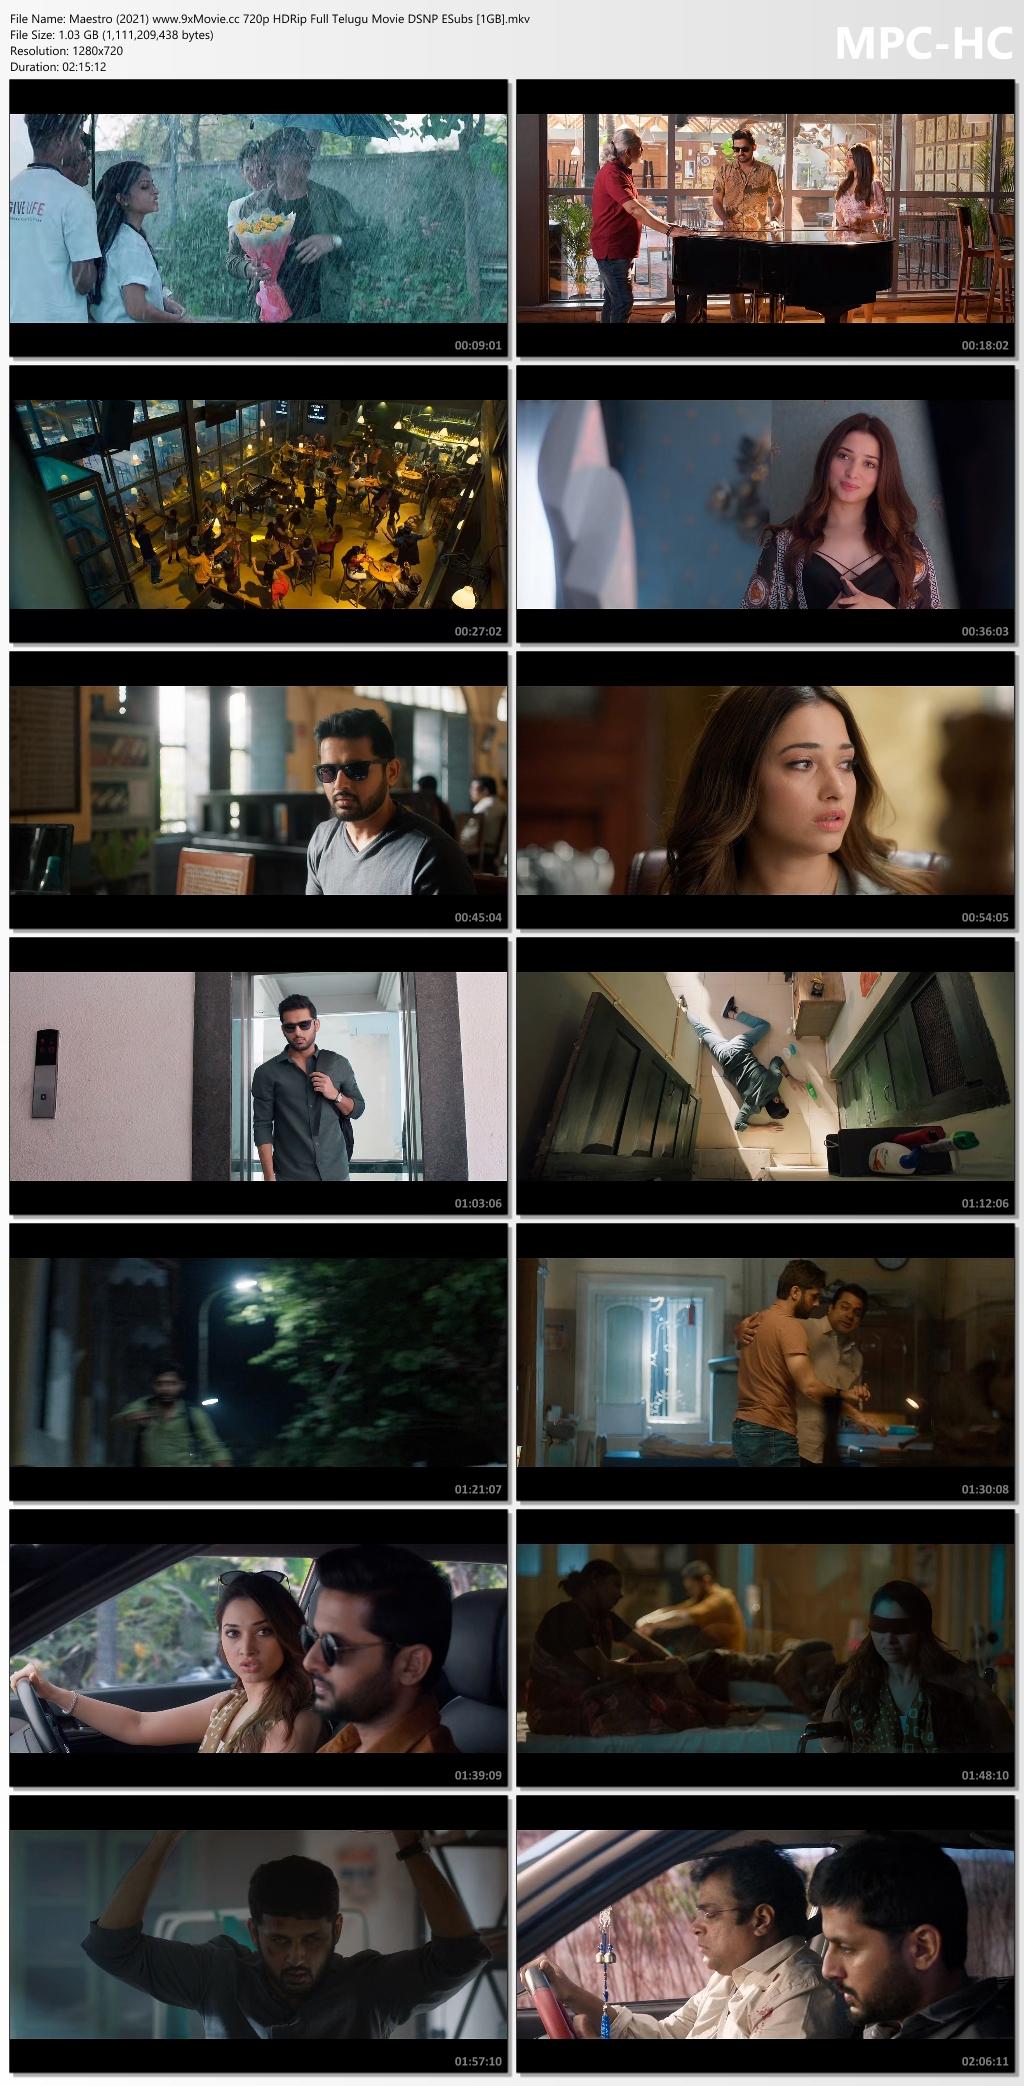 Maestro-2021-www-9x-Movie-cc-720p-HDRip-Full-Telugu-Movie-DSNP-ESubs-1-GB-mkv